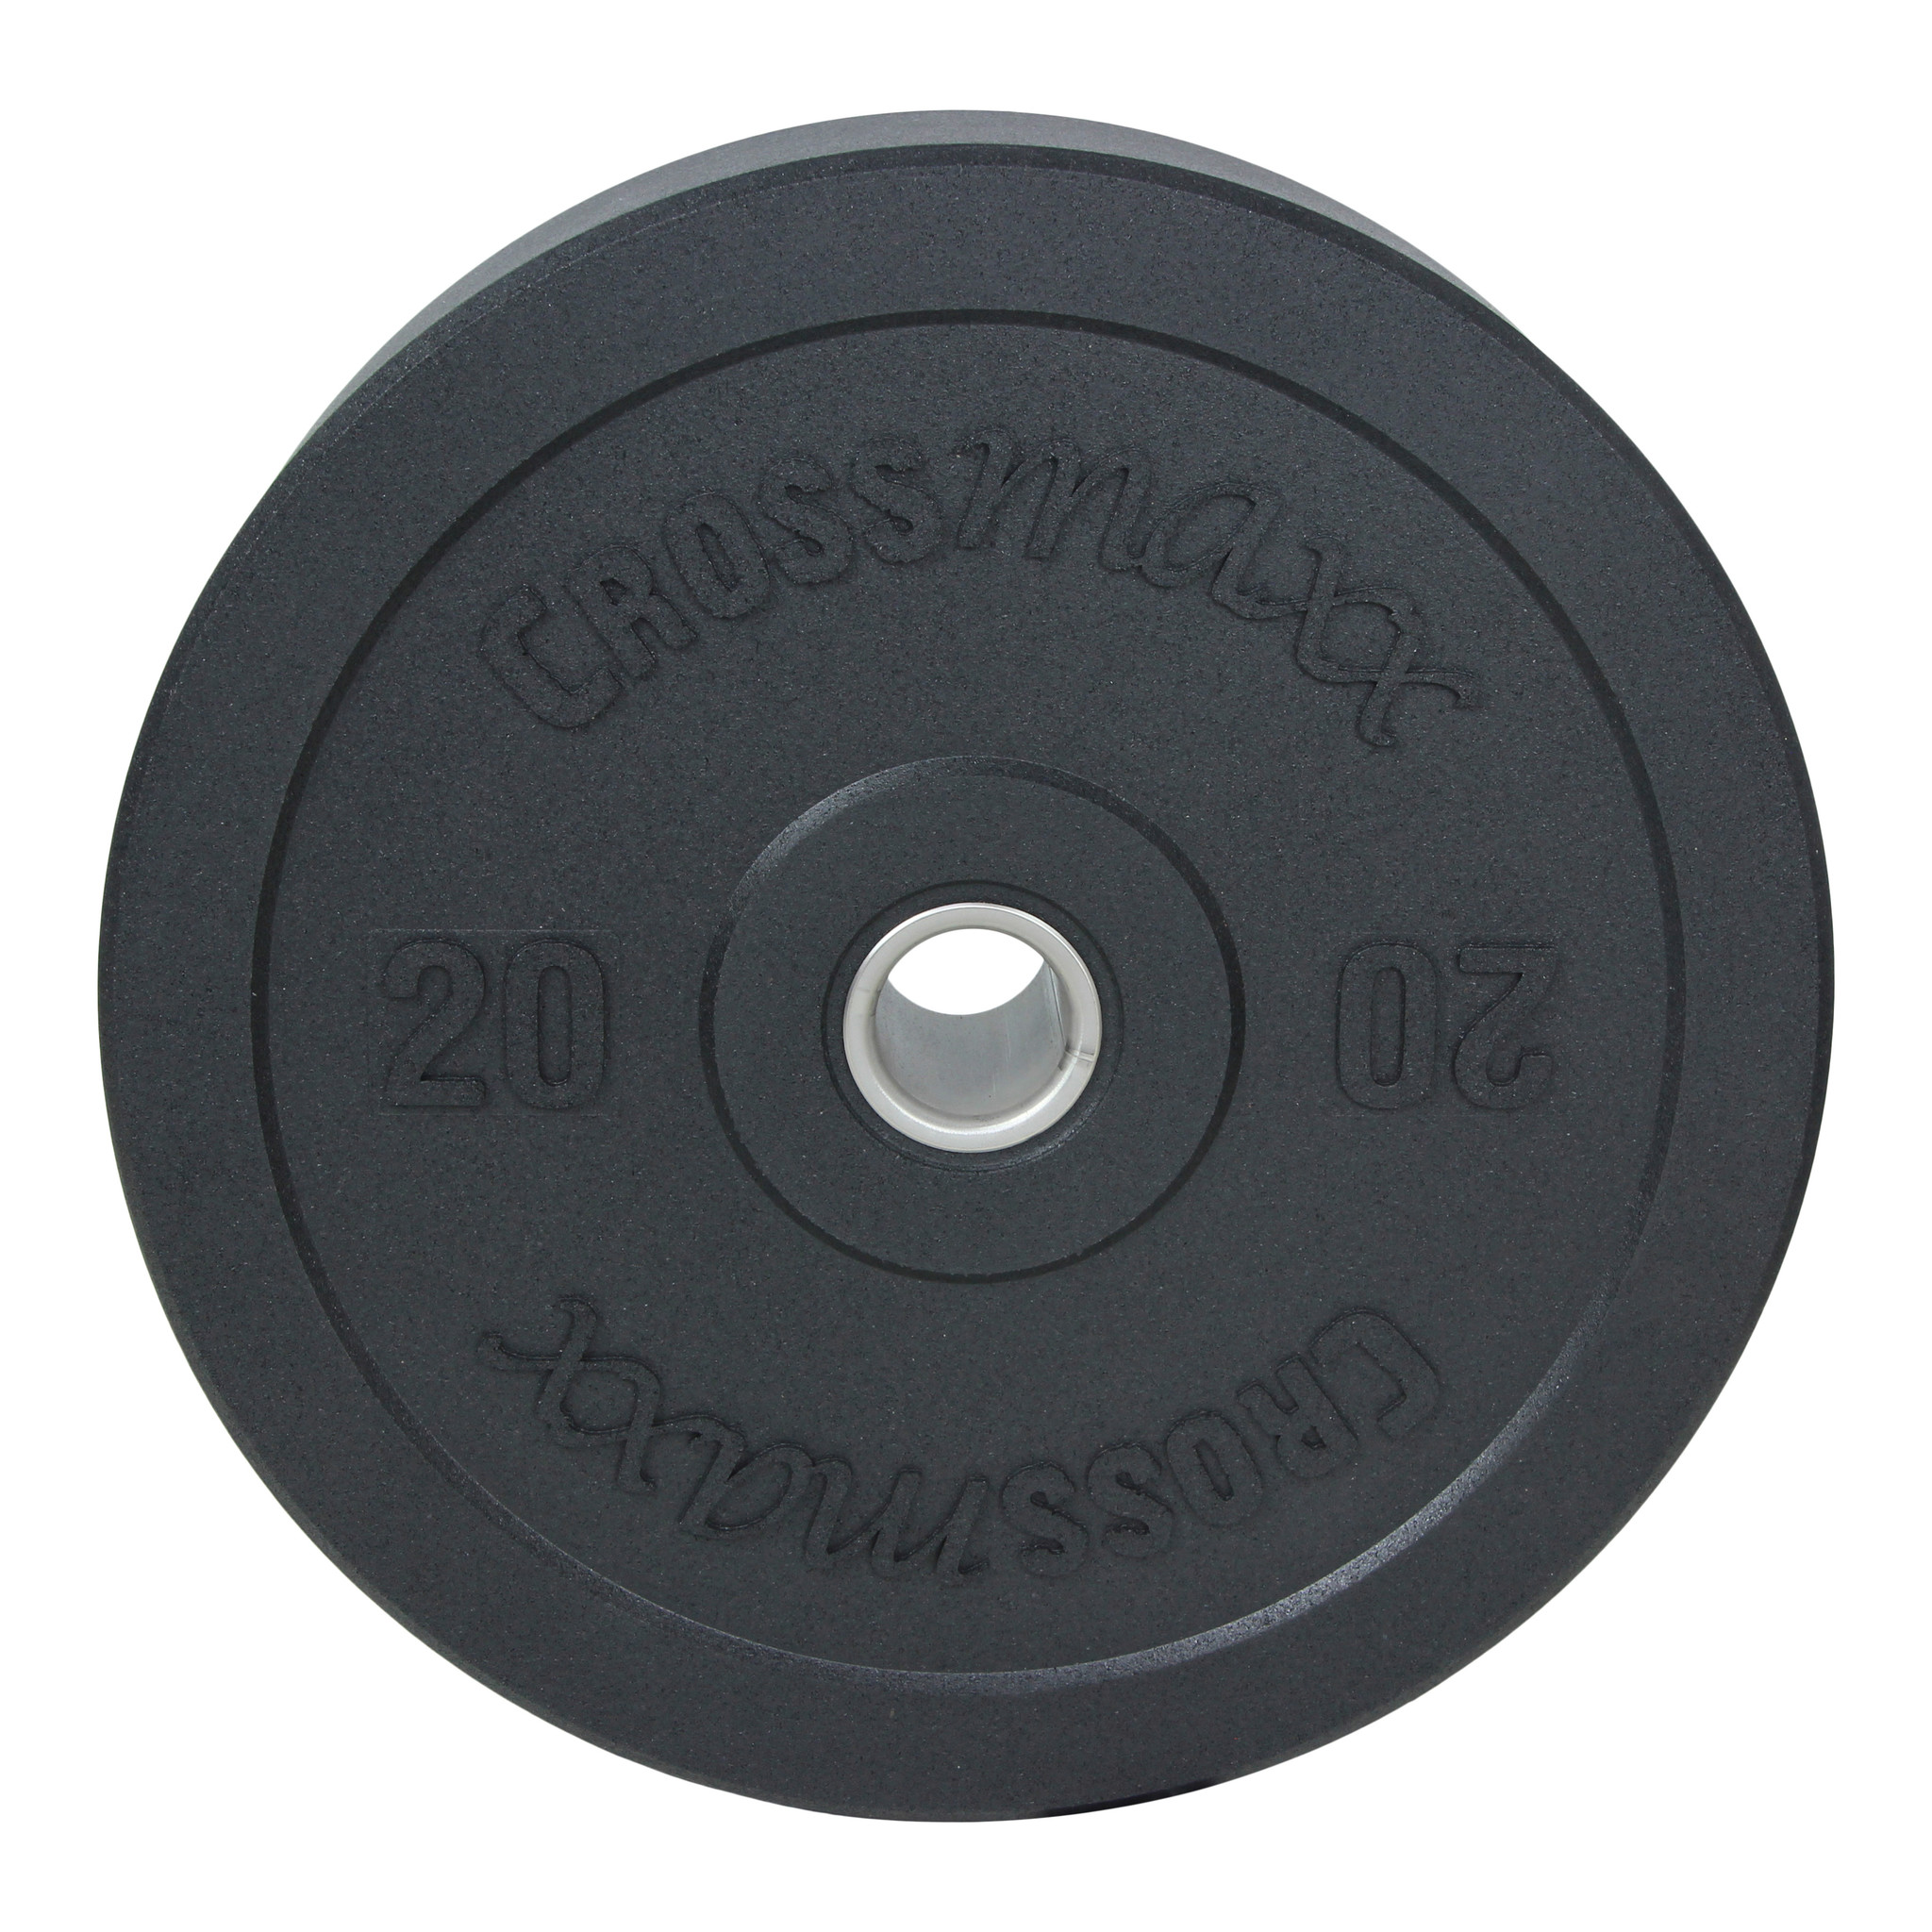 Crossmaxx® LMX97 Hi-Temp bumper plate (EU) 50mm - black (5 - 20kg)